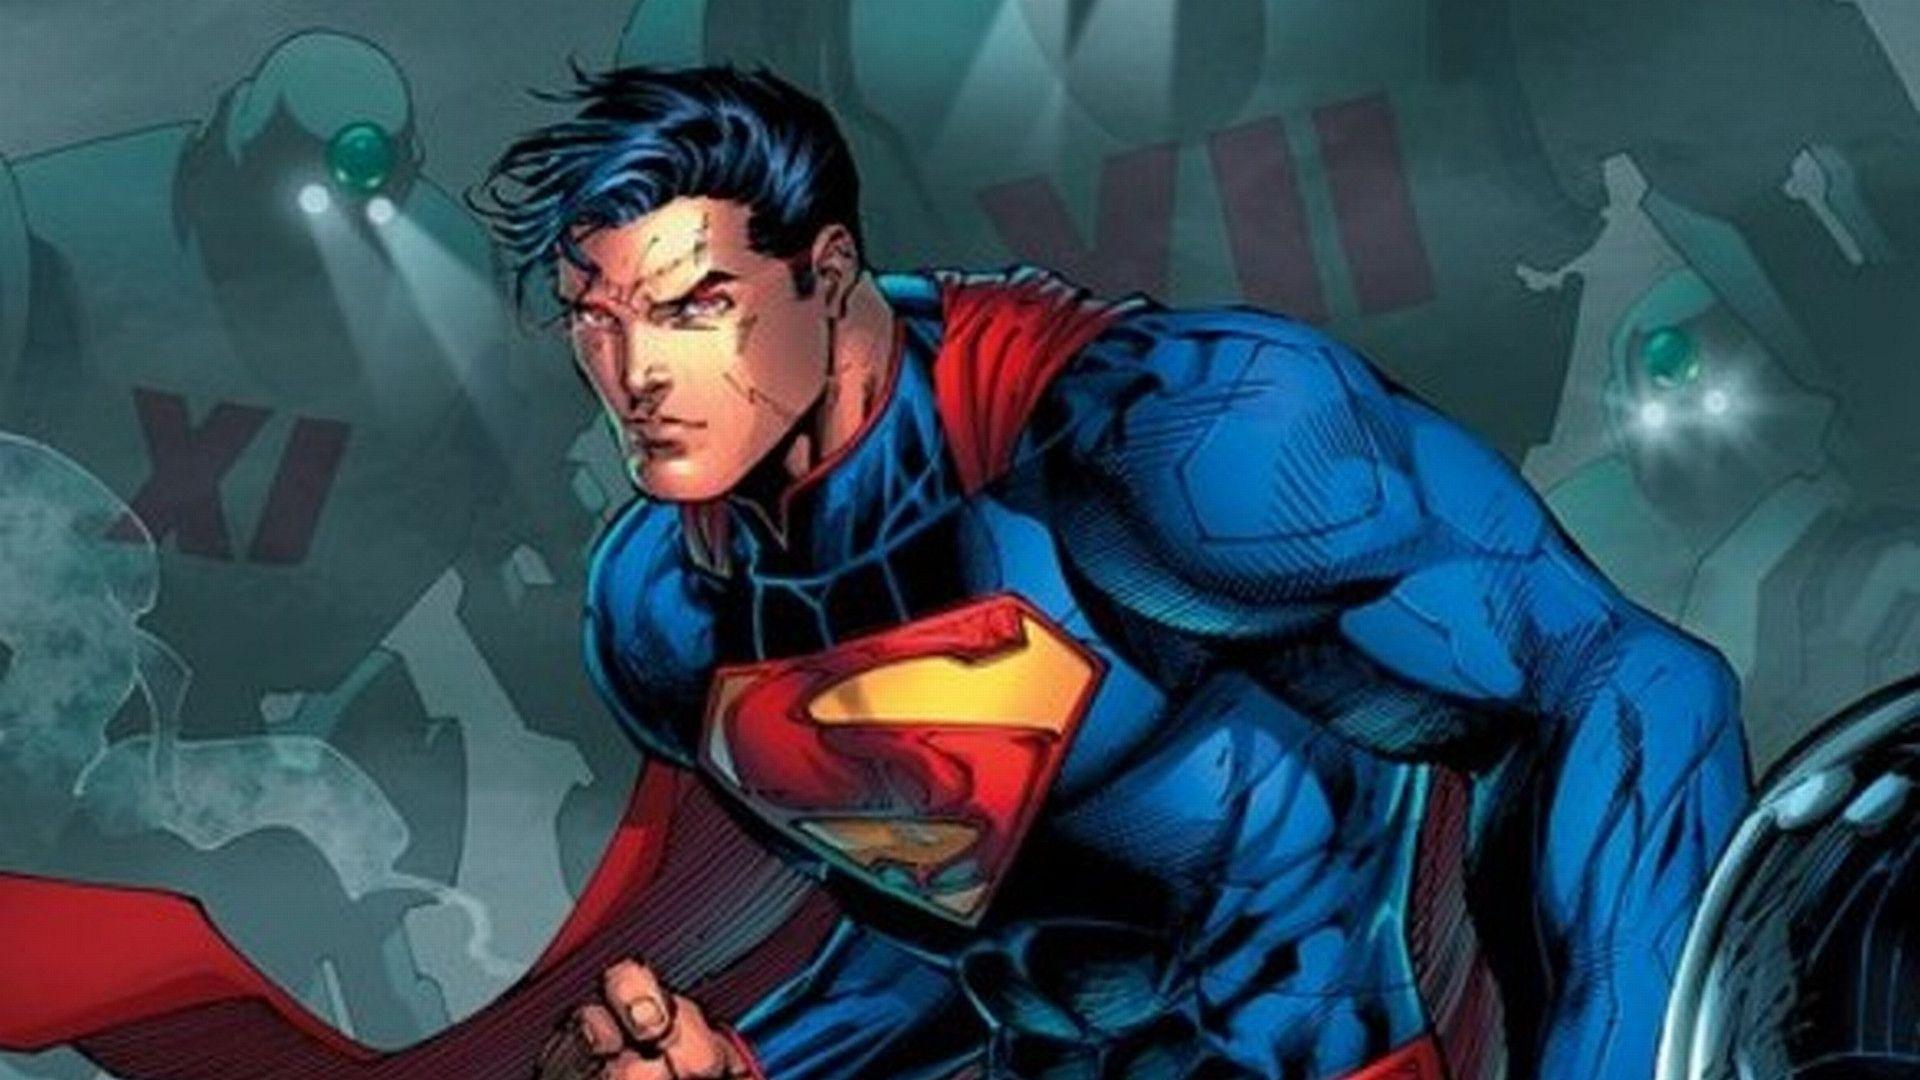 Superman Comic Wallpaper Free For Iphone